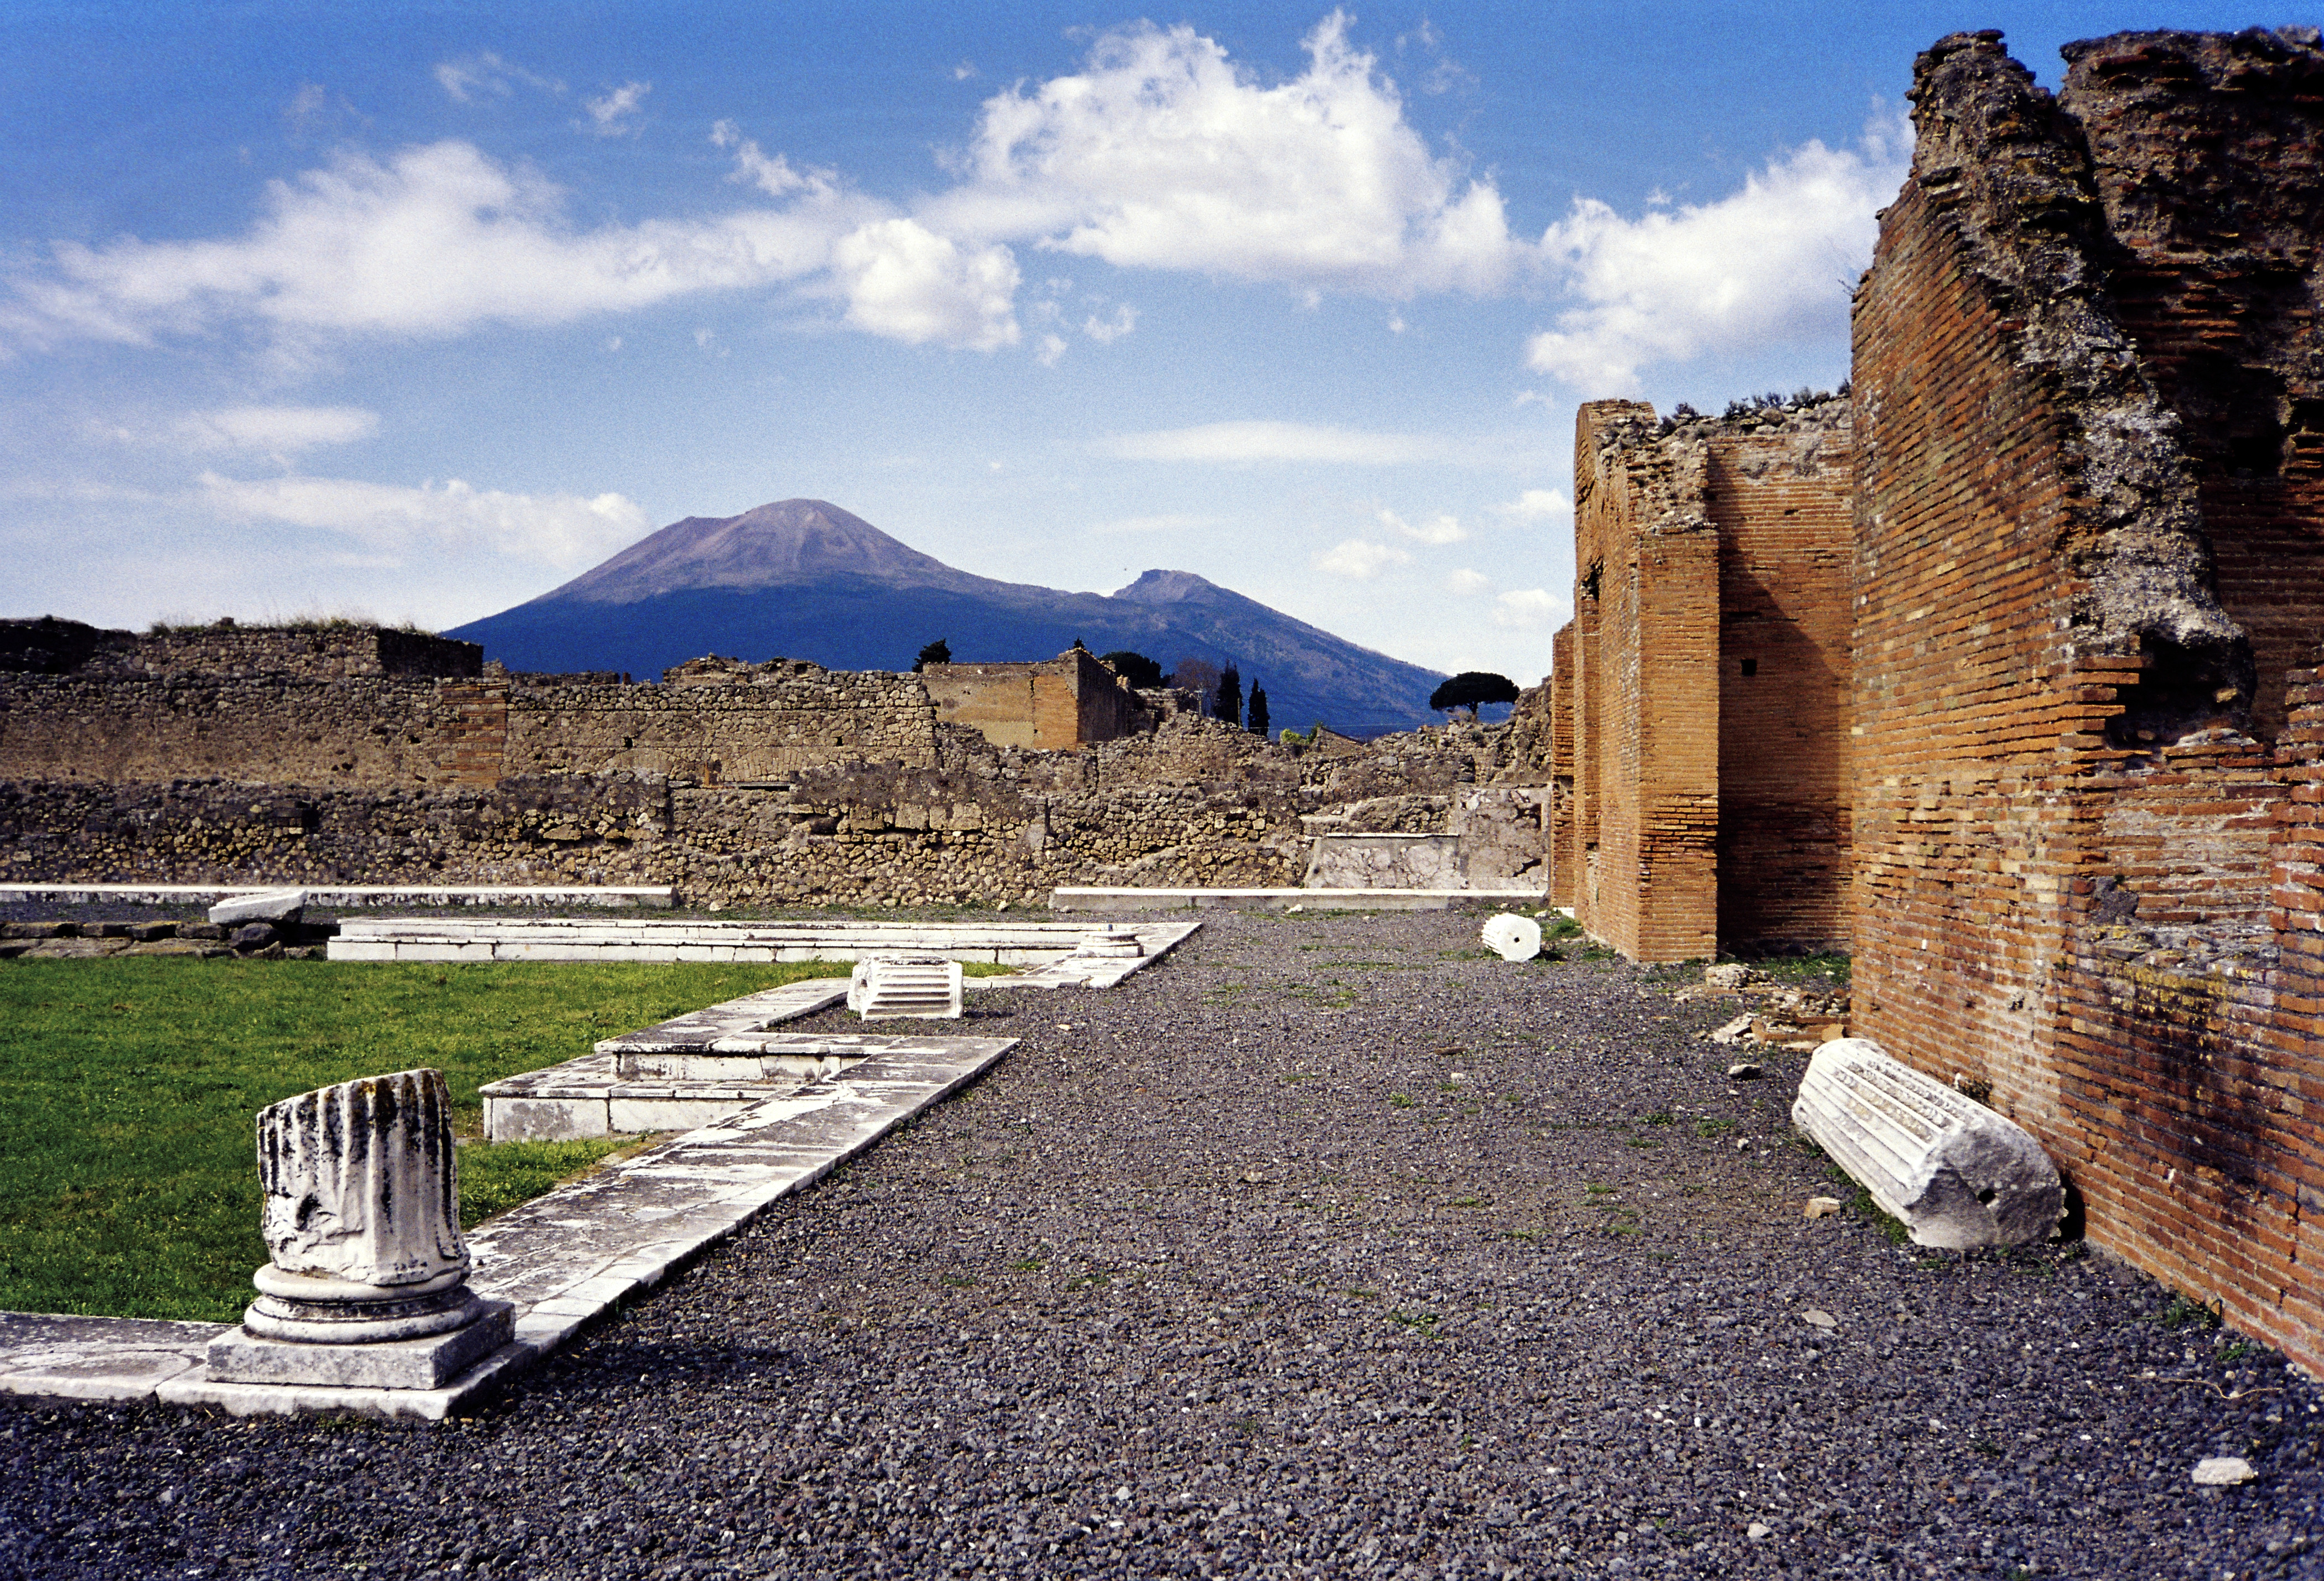 Mount Vesuvius Wikipedia